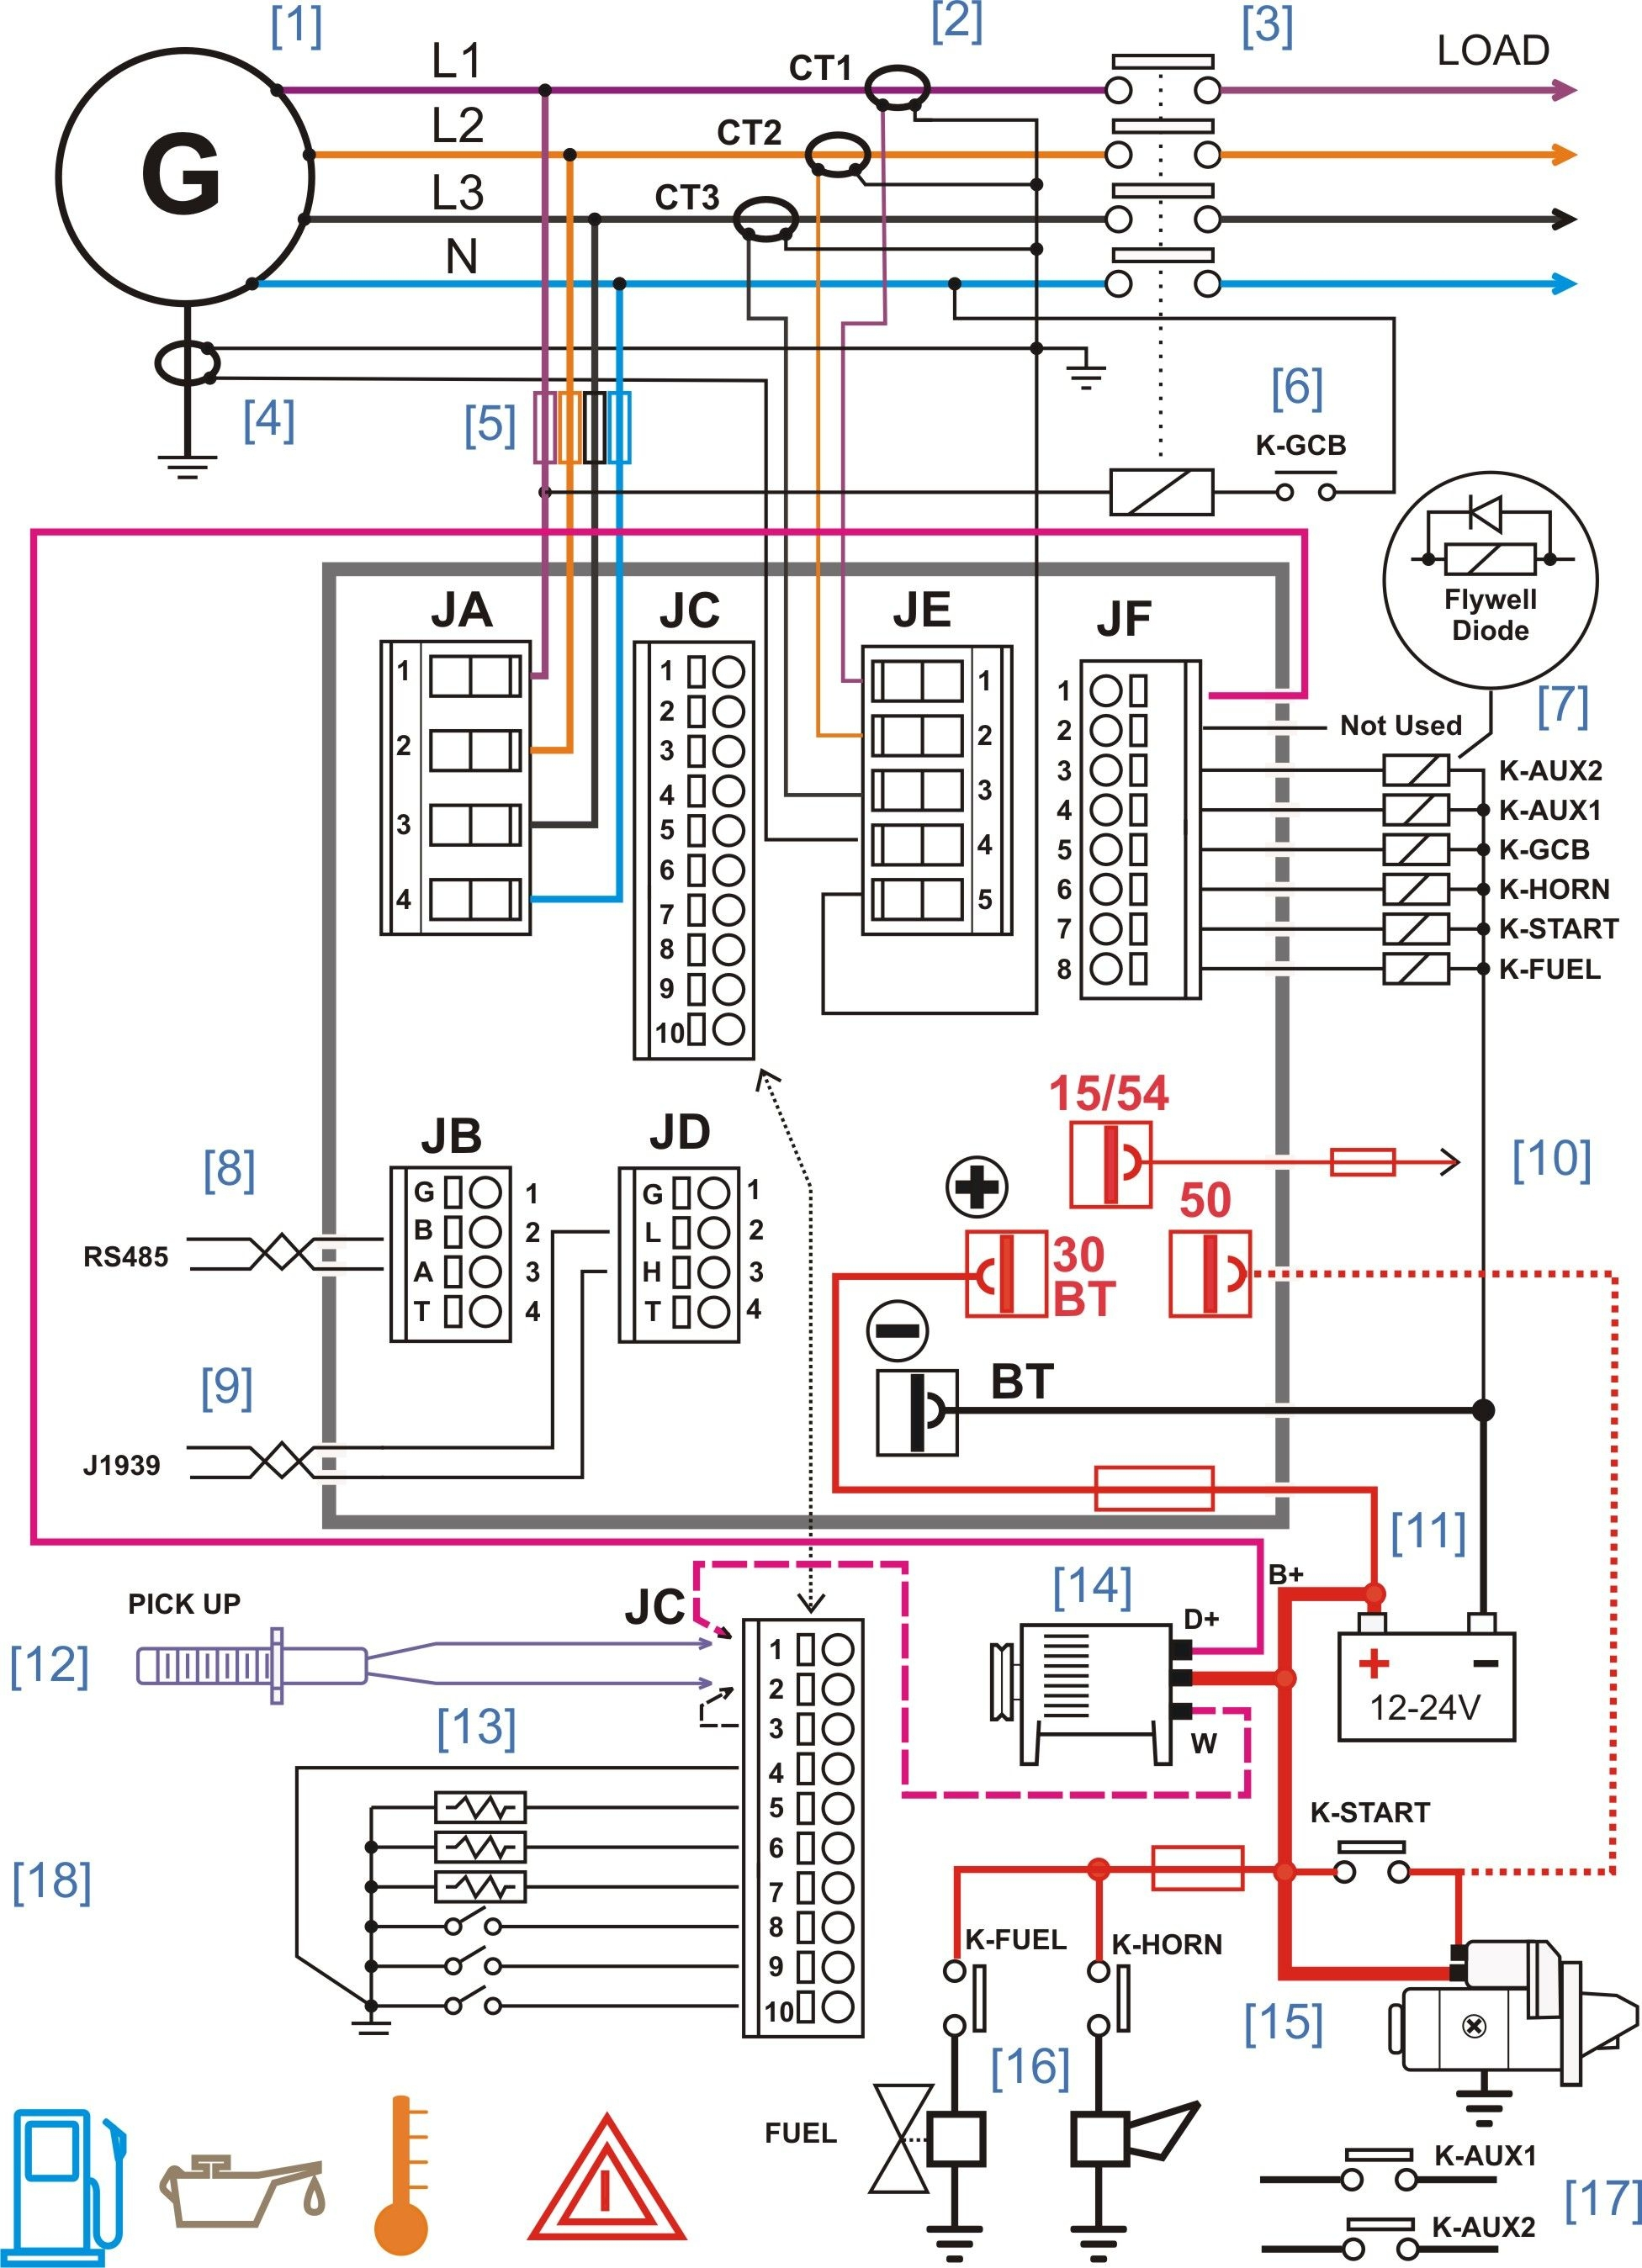 rv automatic transfer switch wiring diagram wiring diagram rv automatic transfer switch wiring diagram rv transfer switch wiring diagram collection diesel generator control